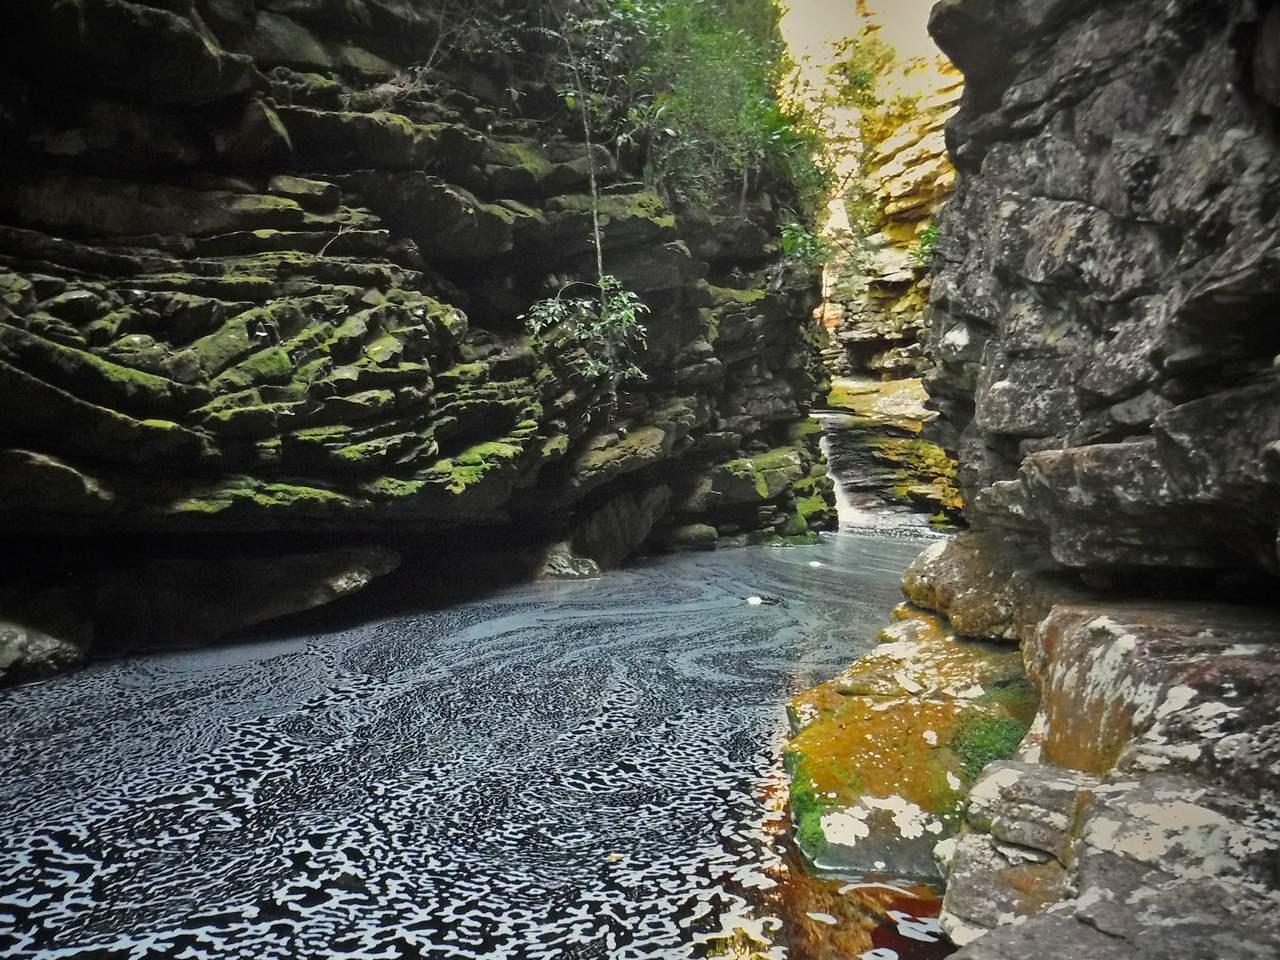 Cachoeira da Mixila, Canyon, Chapada Diamntina, Bahia, Brazil (6)